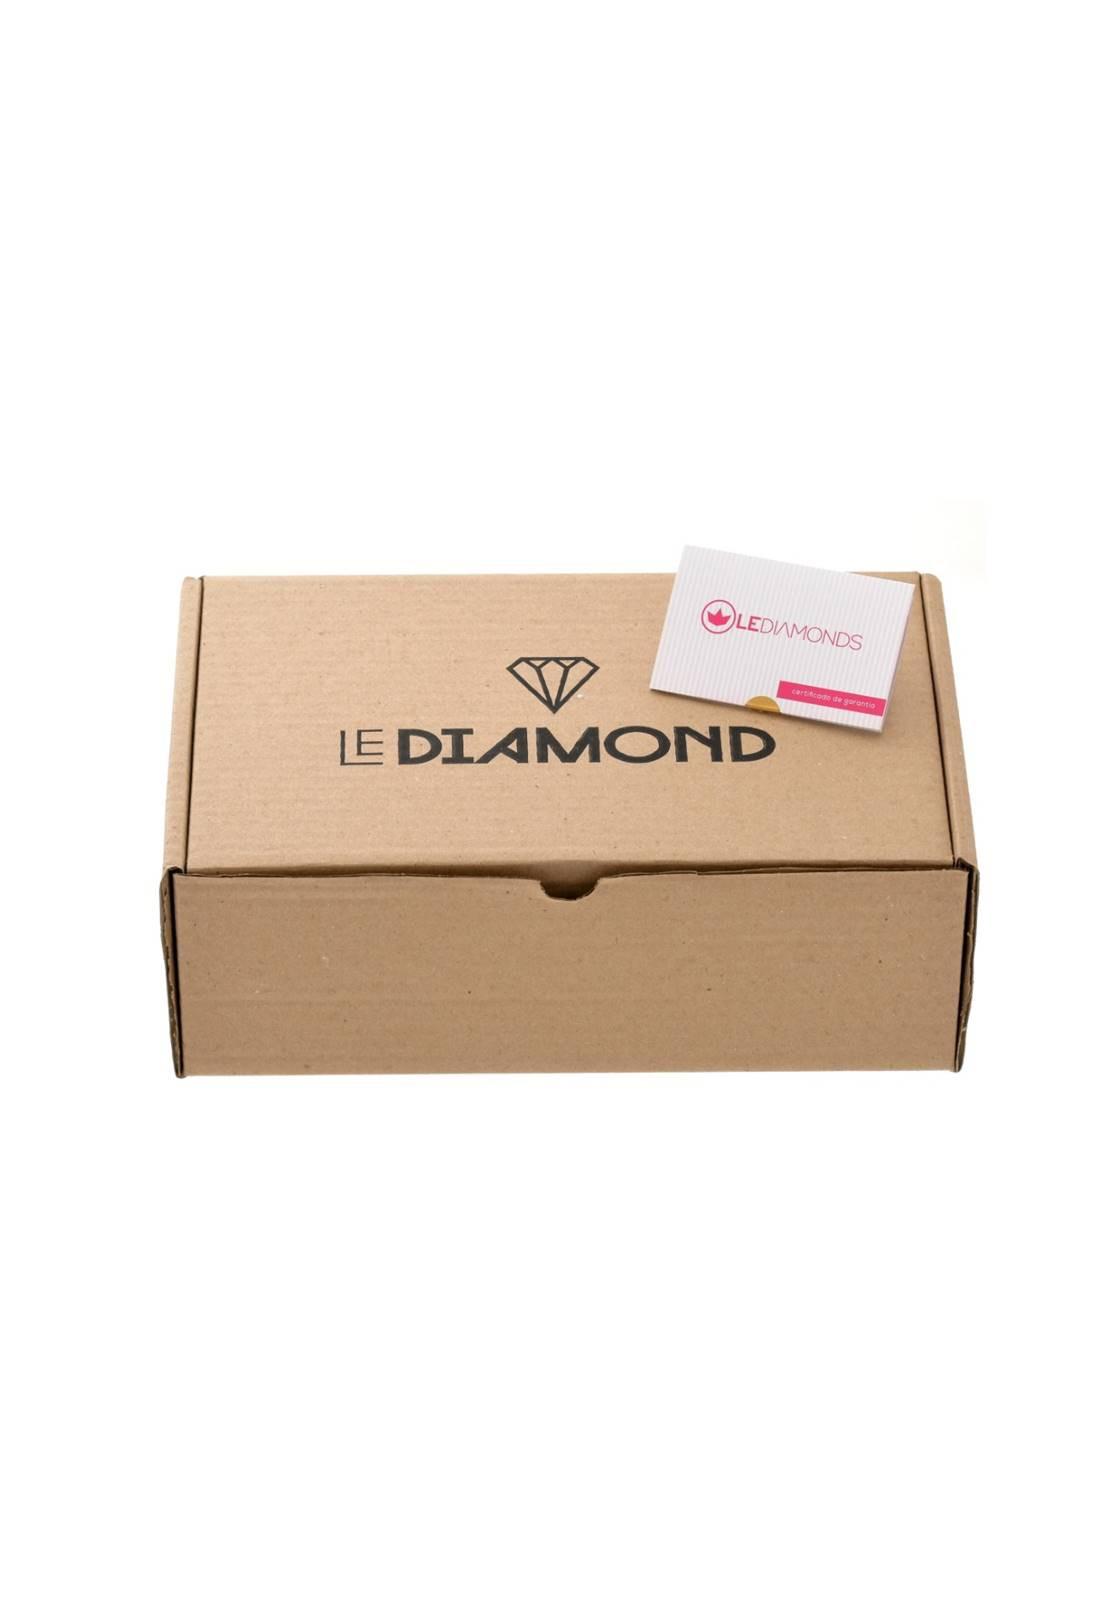 Kit Tarraxa Le Diamond 6 pares Coração Multicolorida